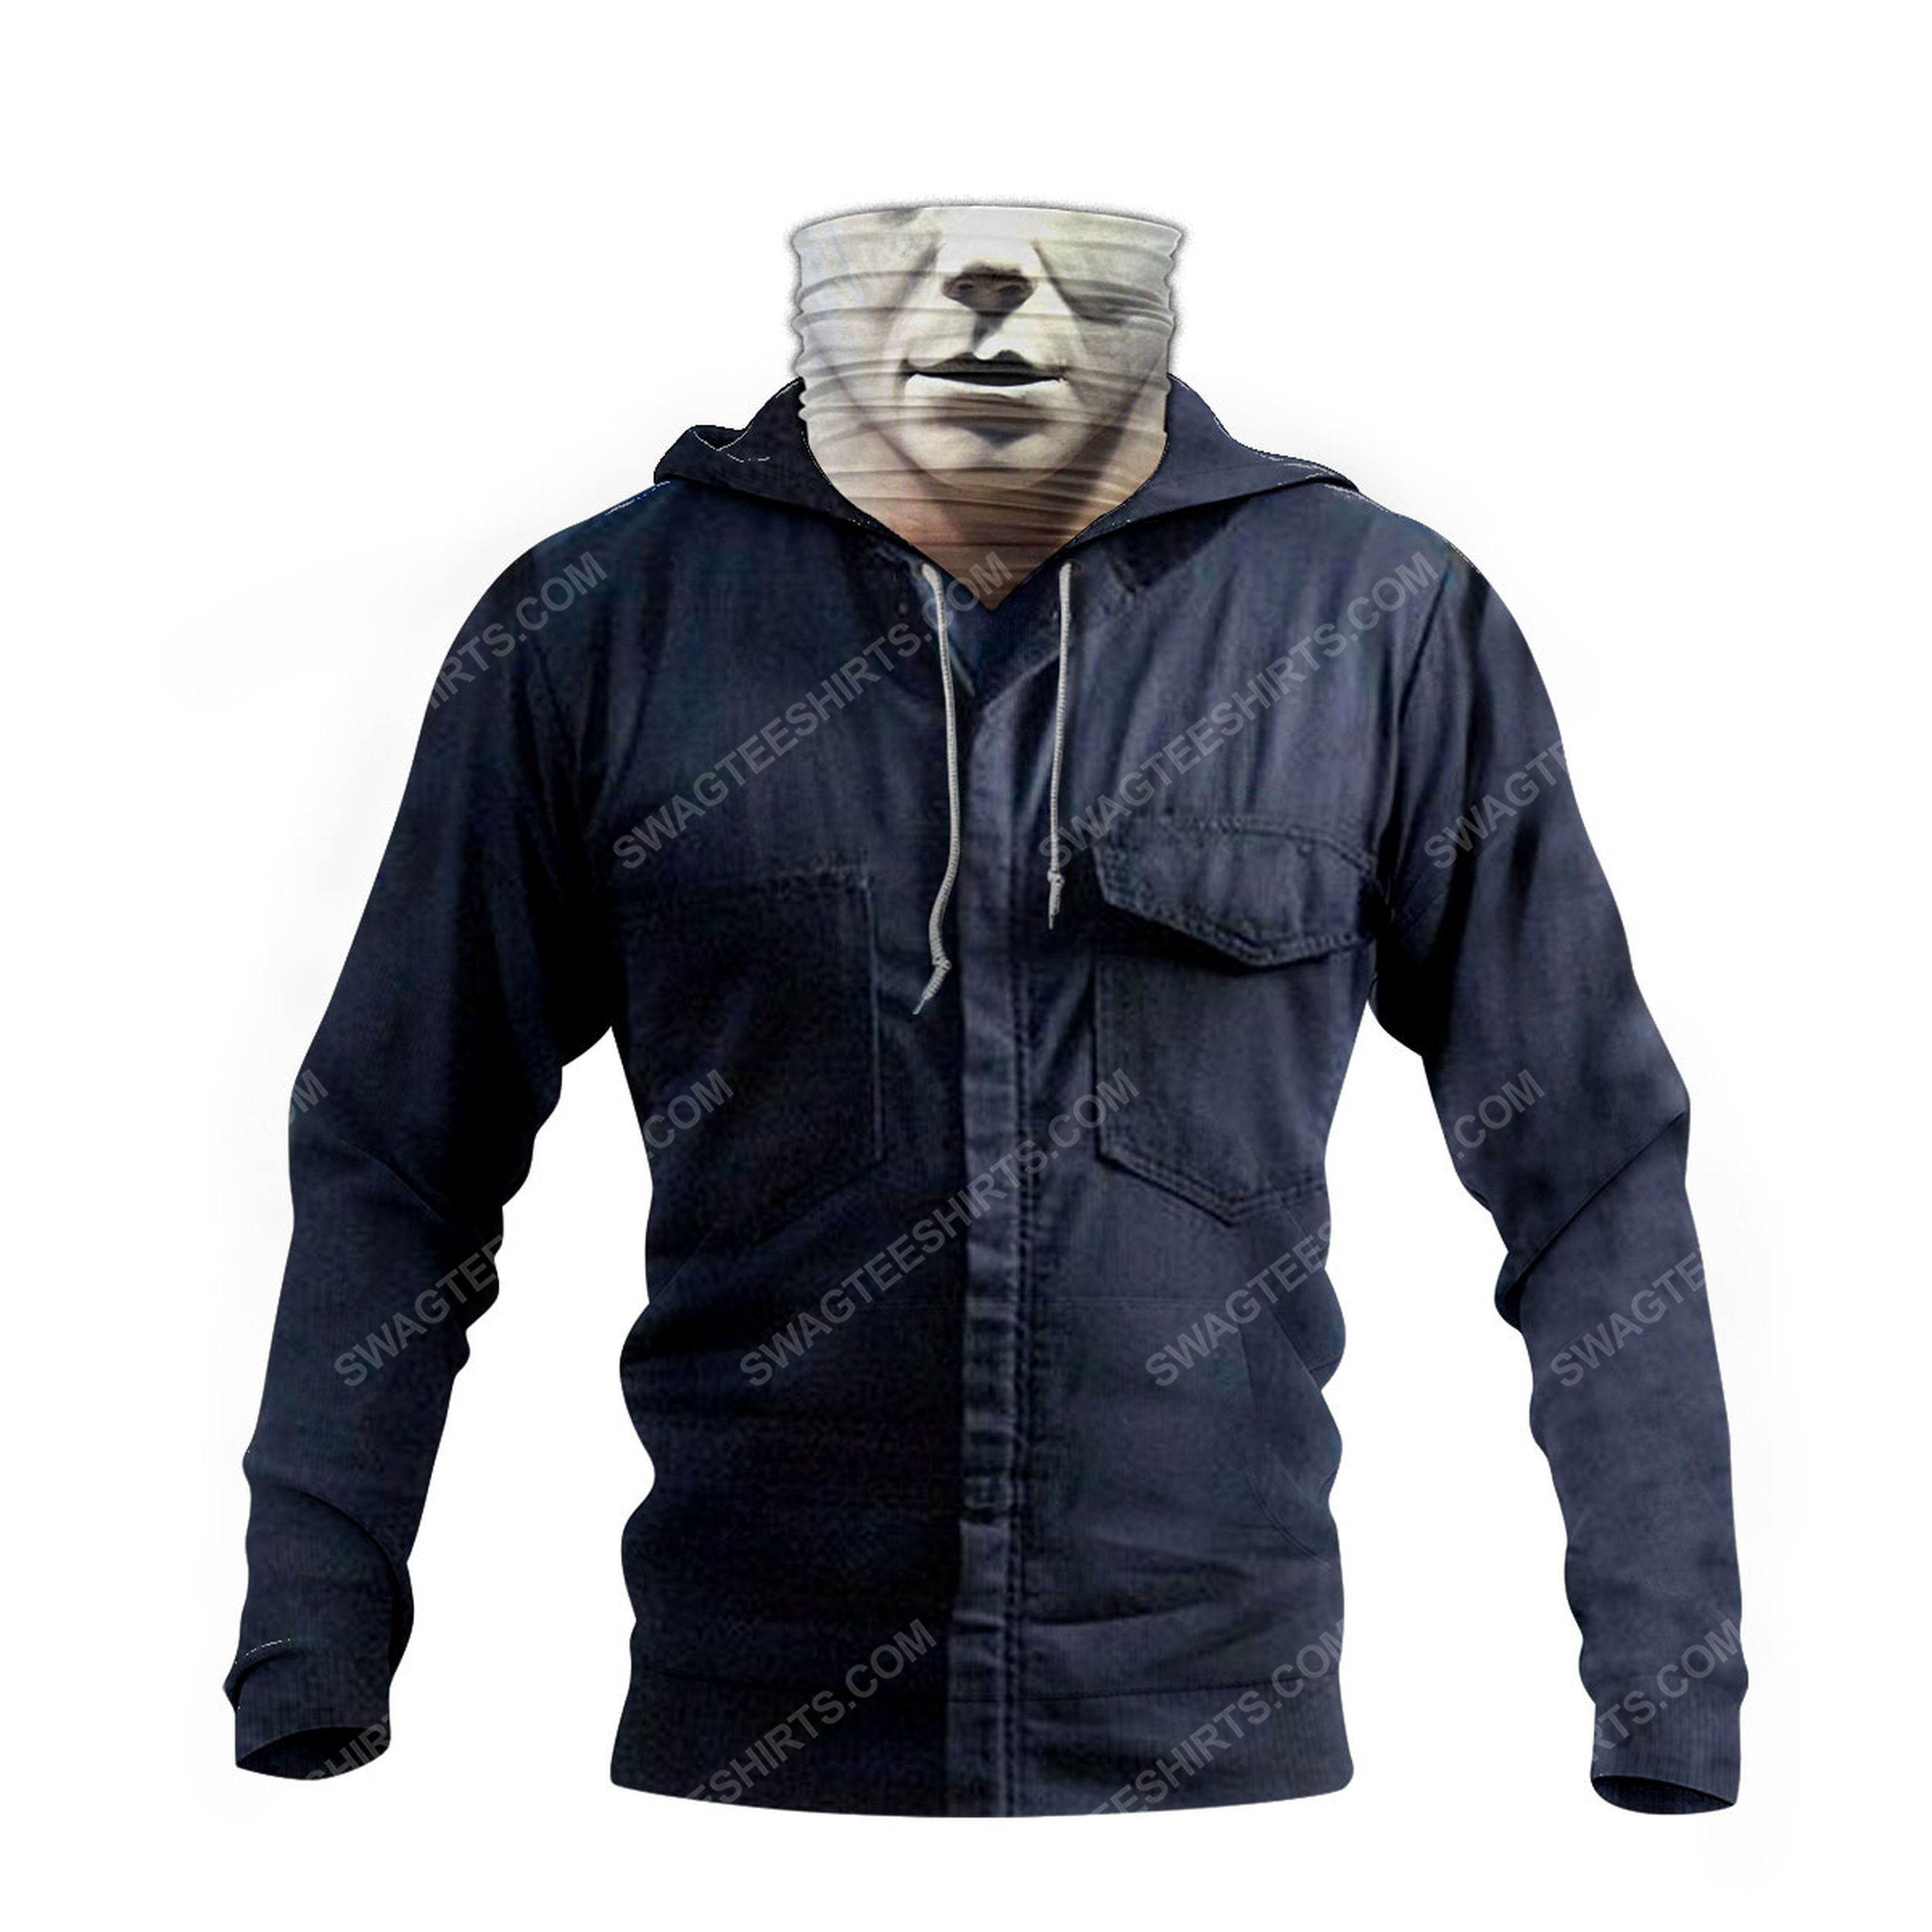 Horror movie michael myers for halloween full print mask hoodie 4(1)